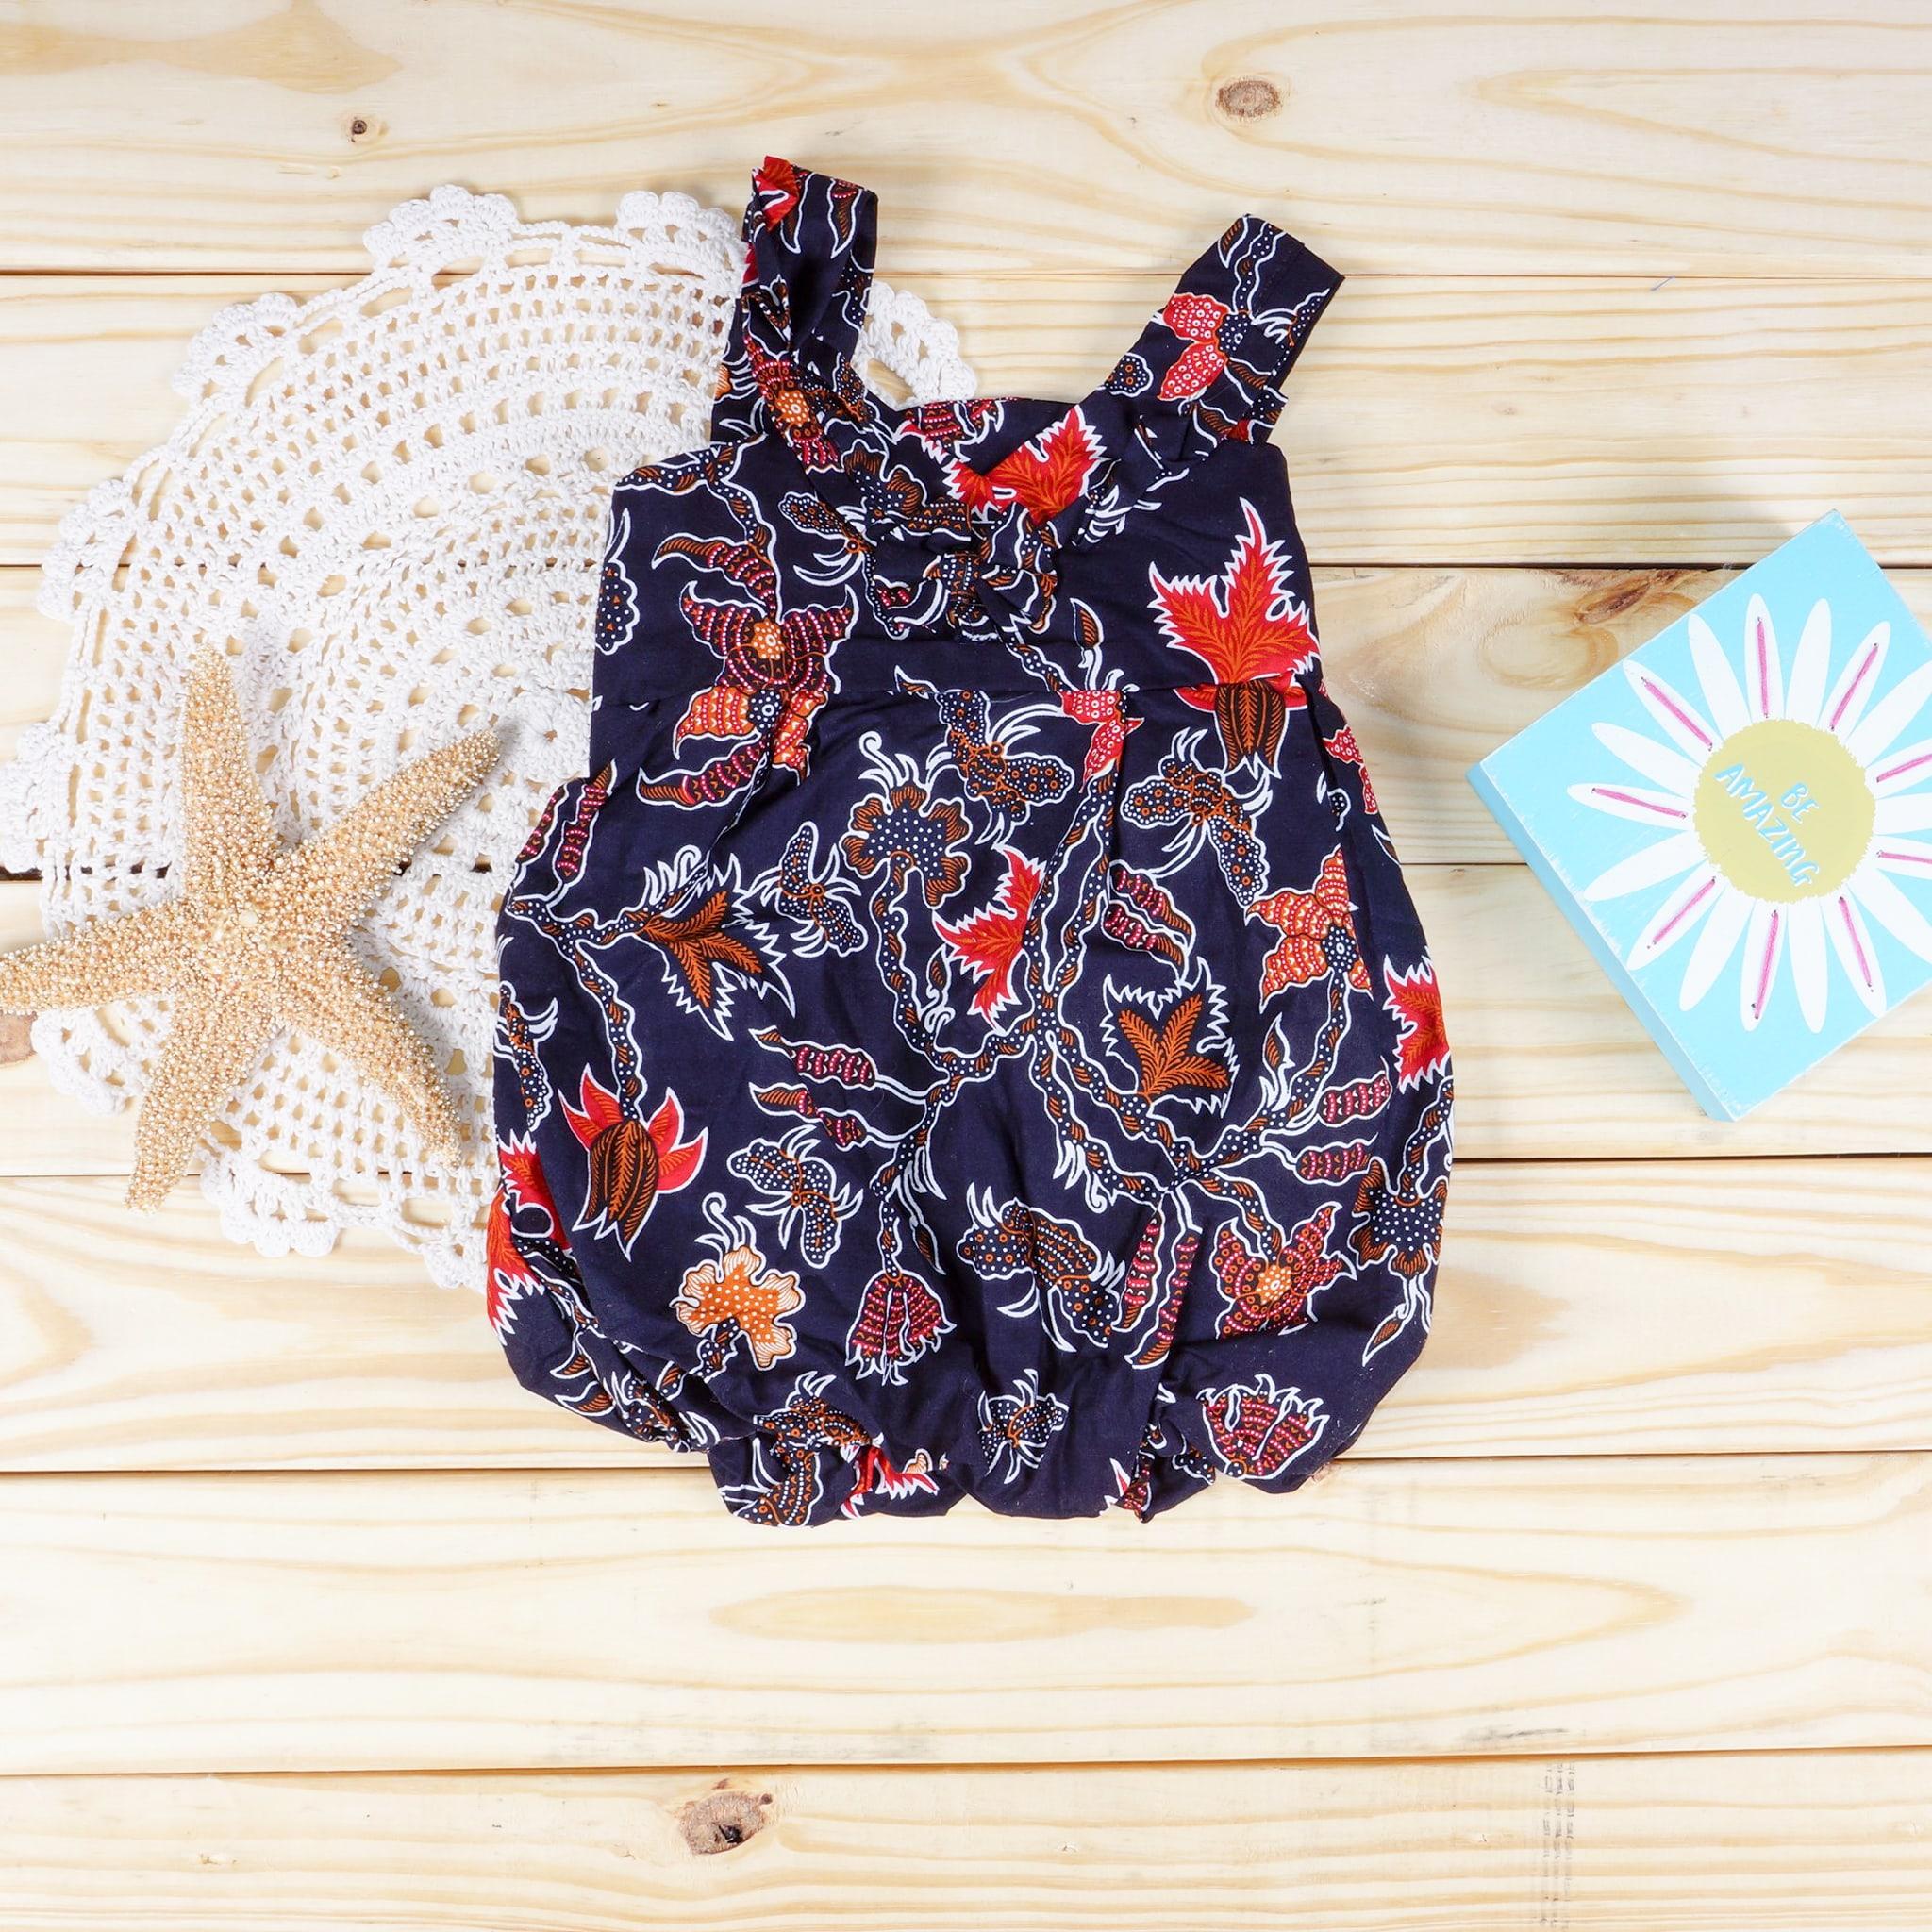 0c3c1ccdd20e Baby Batik Black Floral Dress - Size 6-9 Months - My Nonika